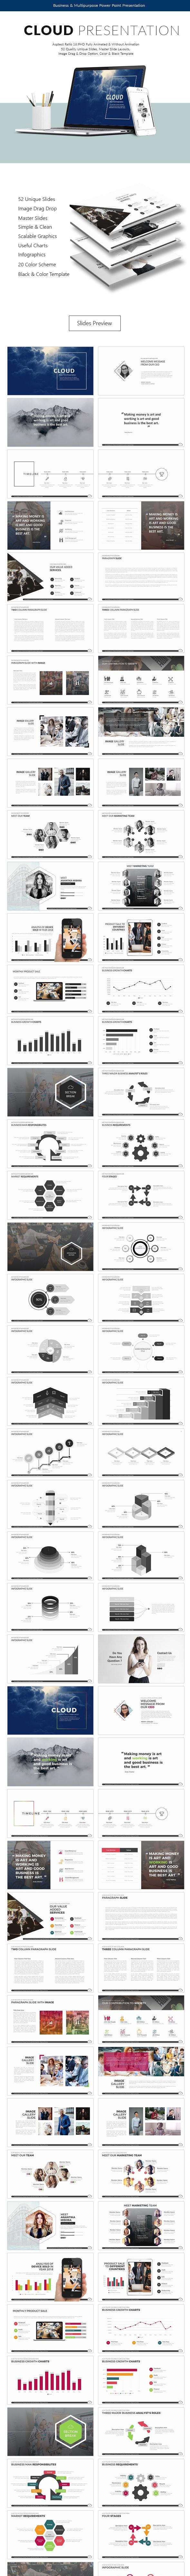 Cloud Power Point Presentation Template - Business PowerPoint Templates